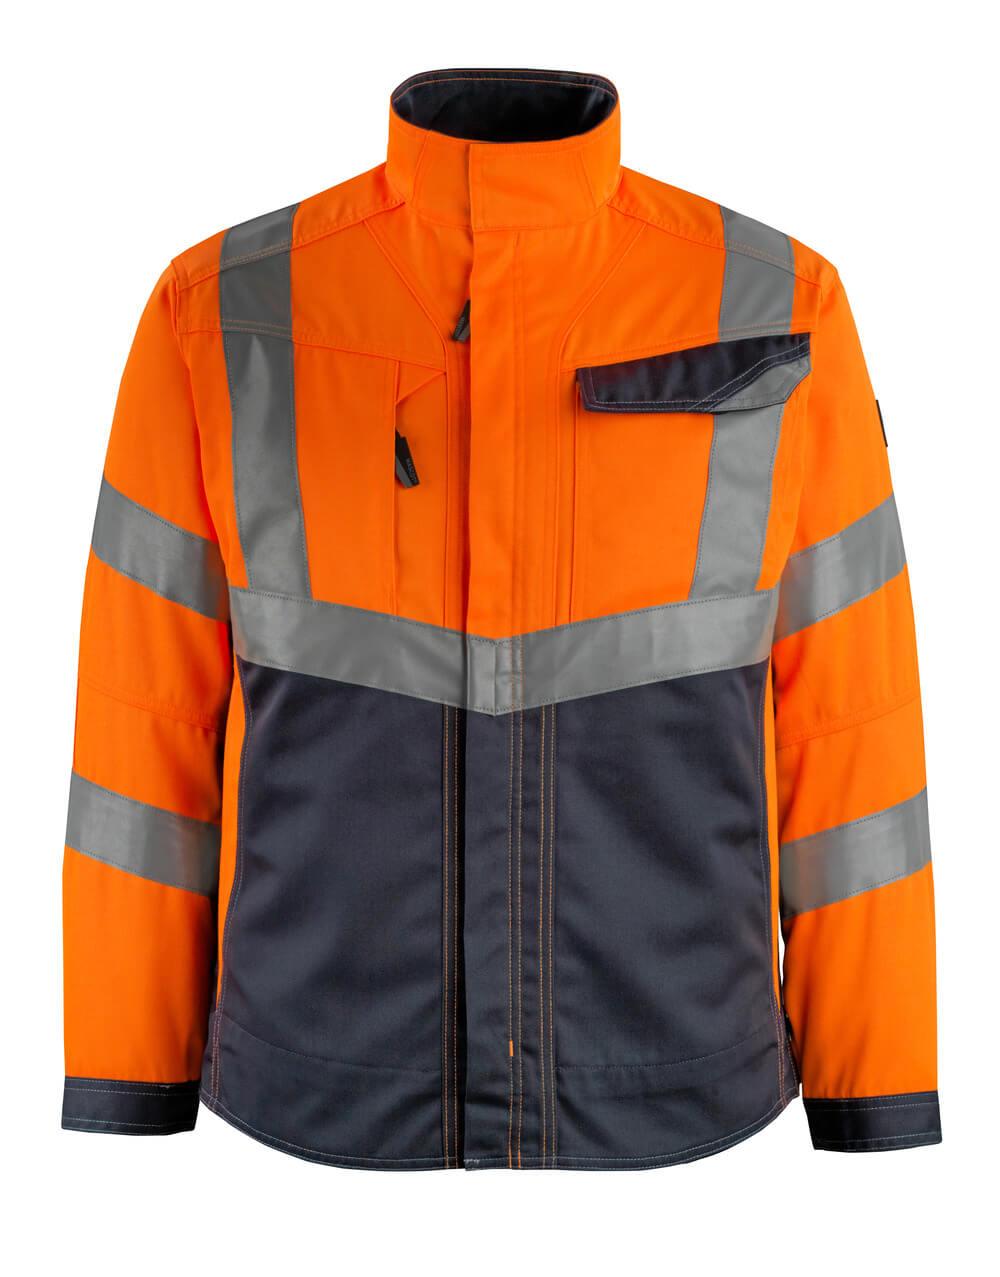 15509-860-14010 Veste - Hi-vis orange/Marine foncé